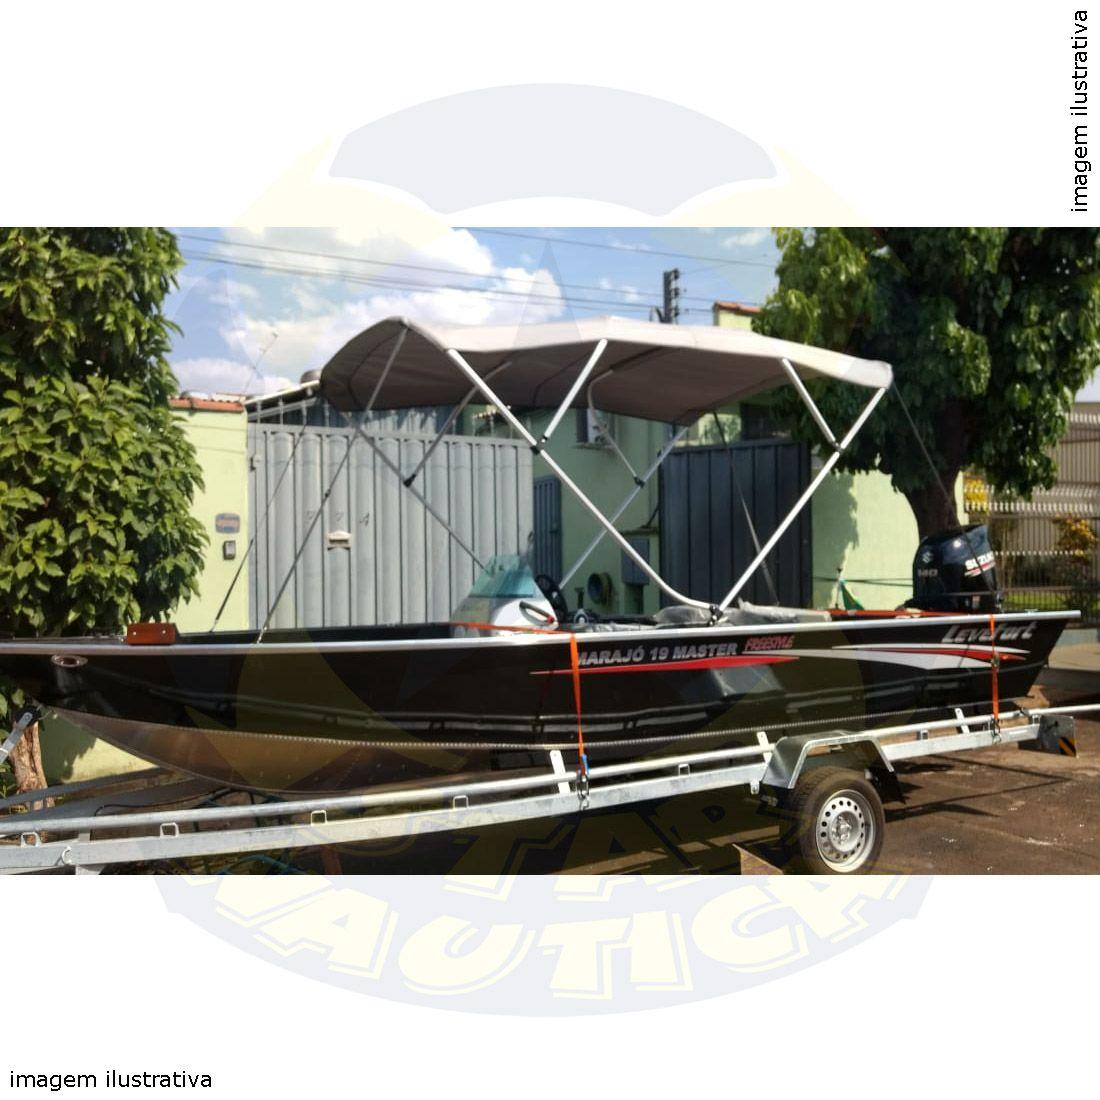 Capota Toldo Lancha Big Fish 5014 Sport Poliéster 4 Arcos Tubo 1 1/4